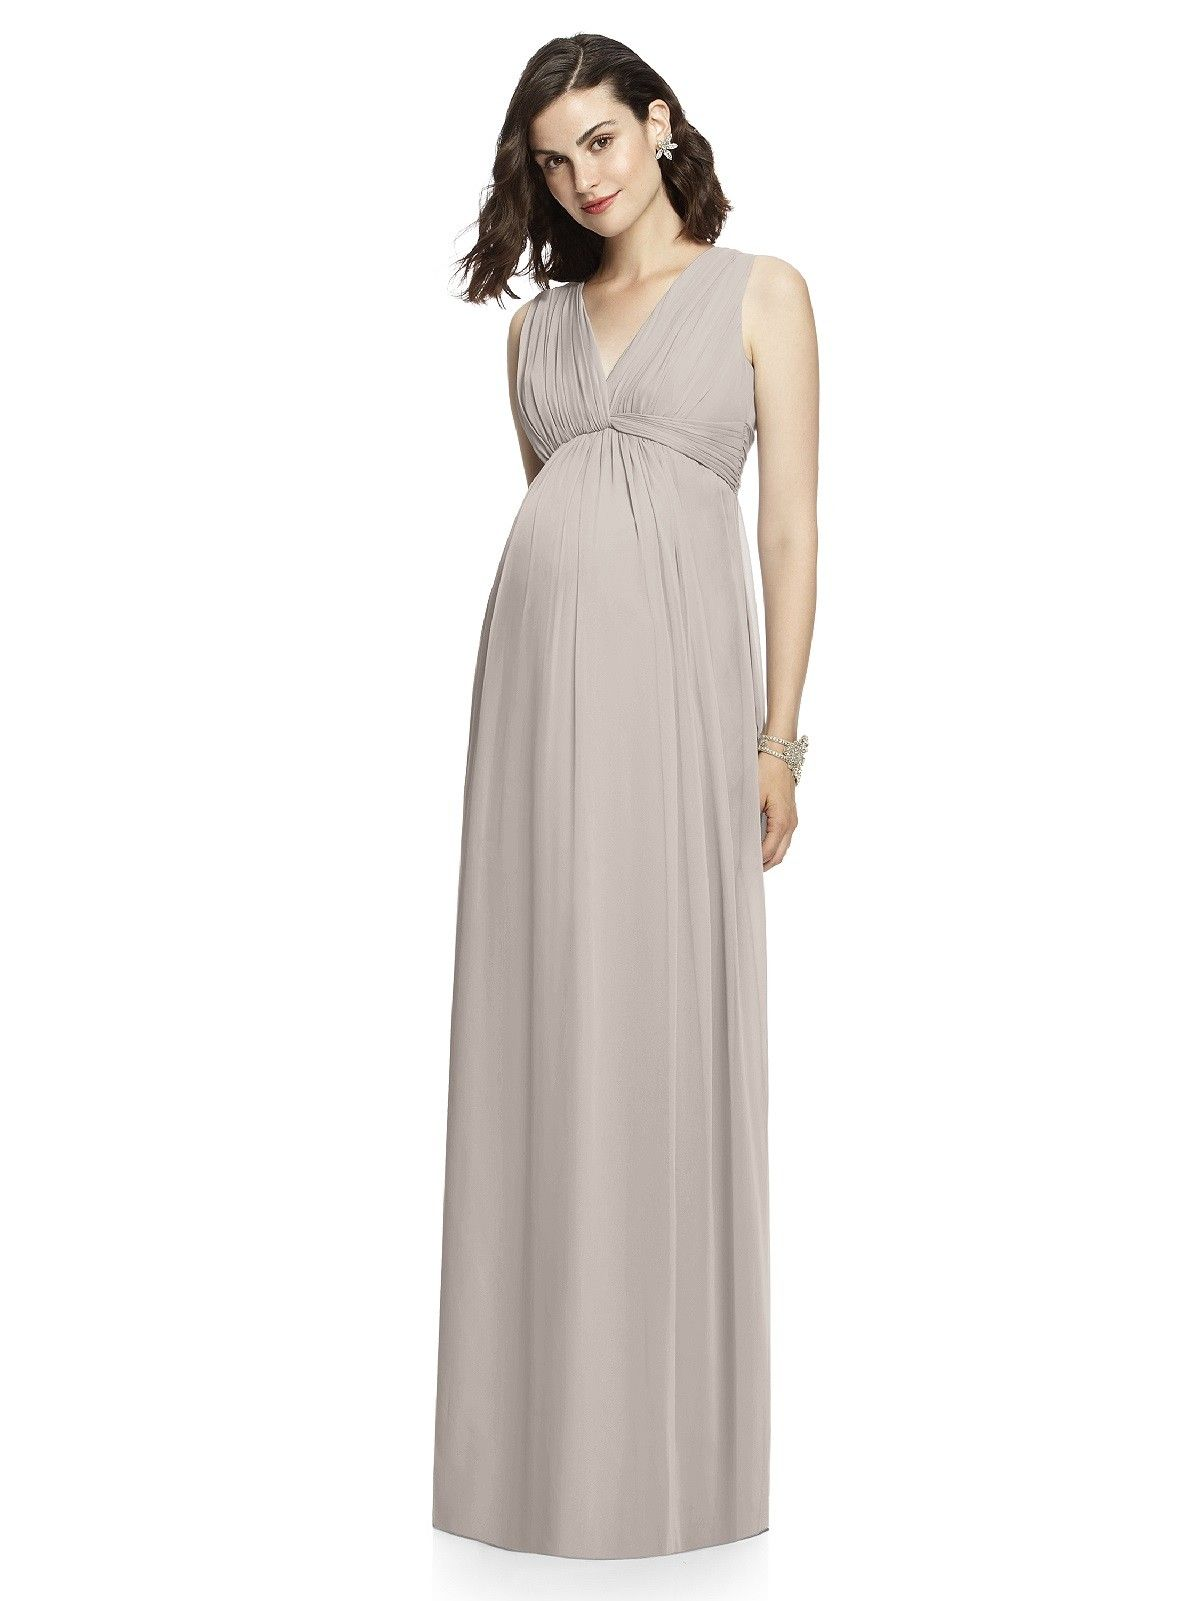 Wishesbridal Grey V Neck Floor Length Chiffon A Line #Maternity #BridesmaidDress B1de0075